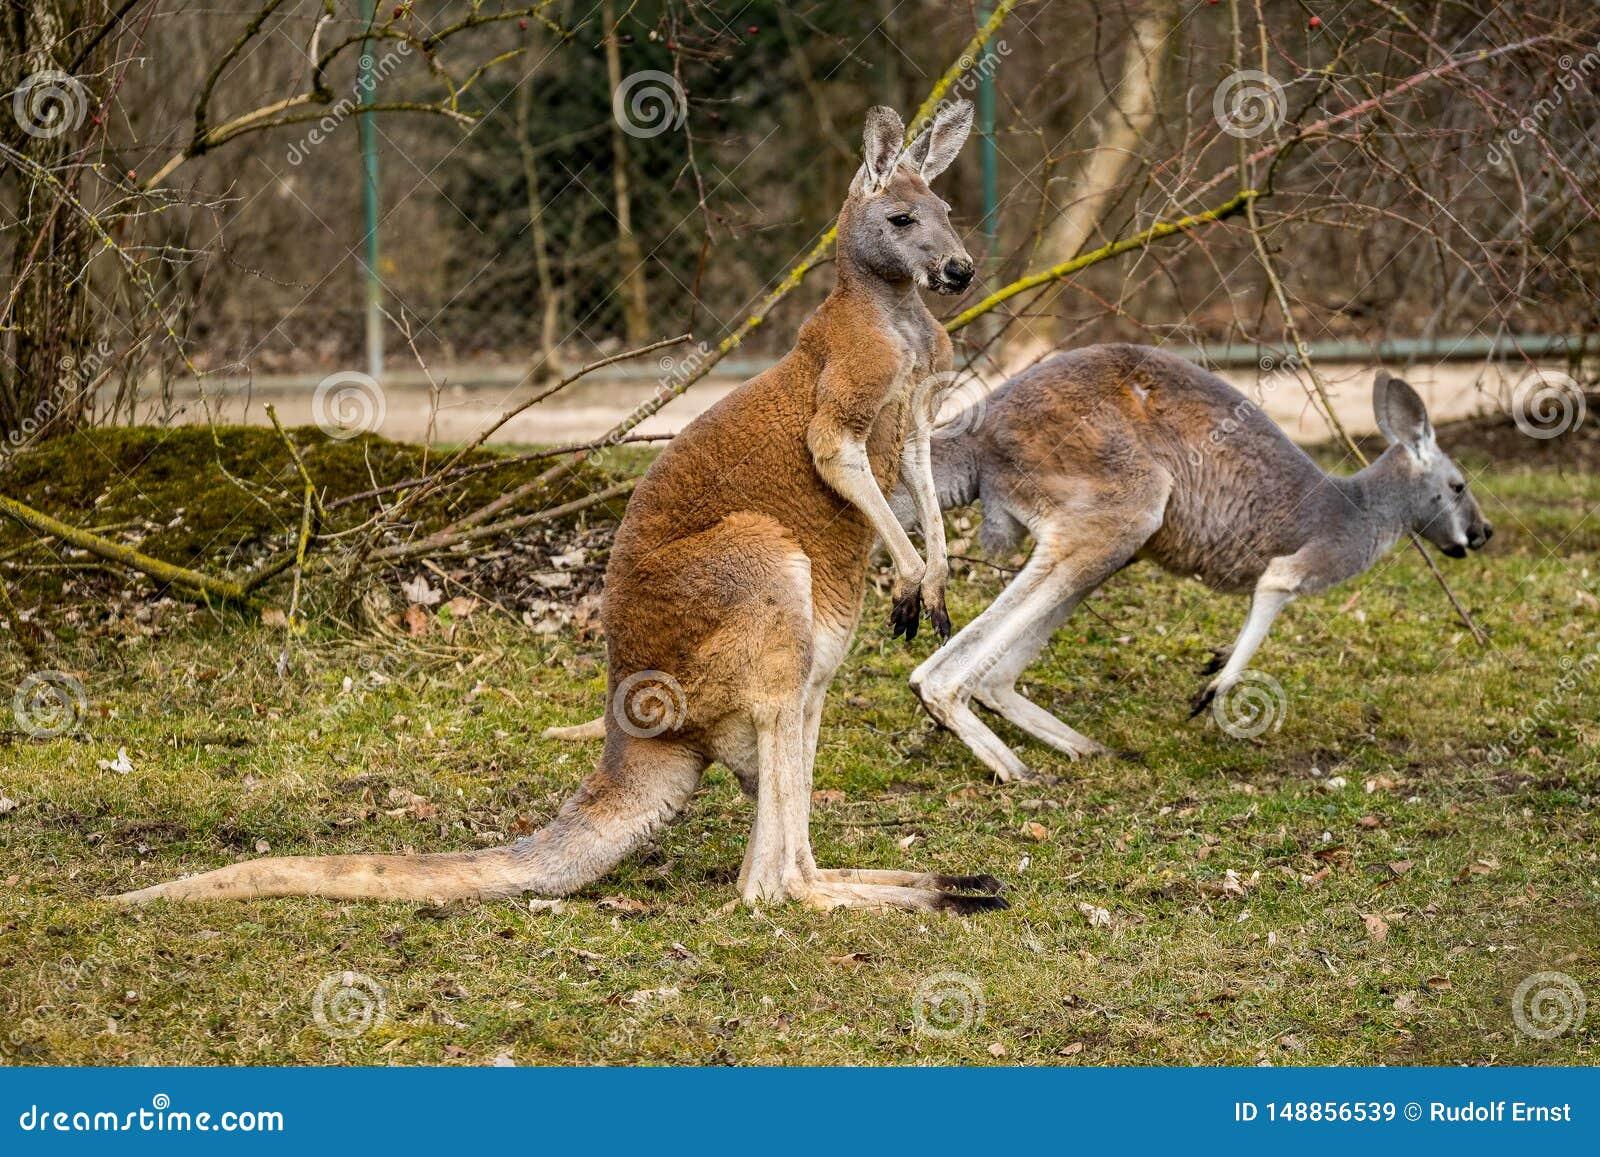 Roter K?nguru, Macropus rufus in einem deutschen Zoo